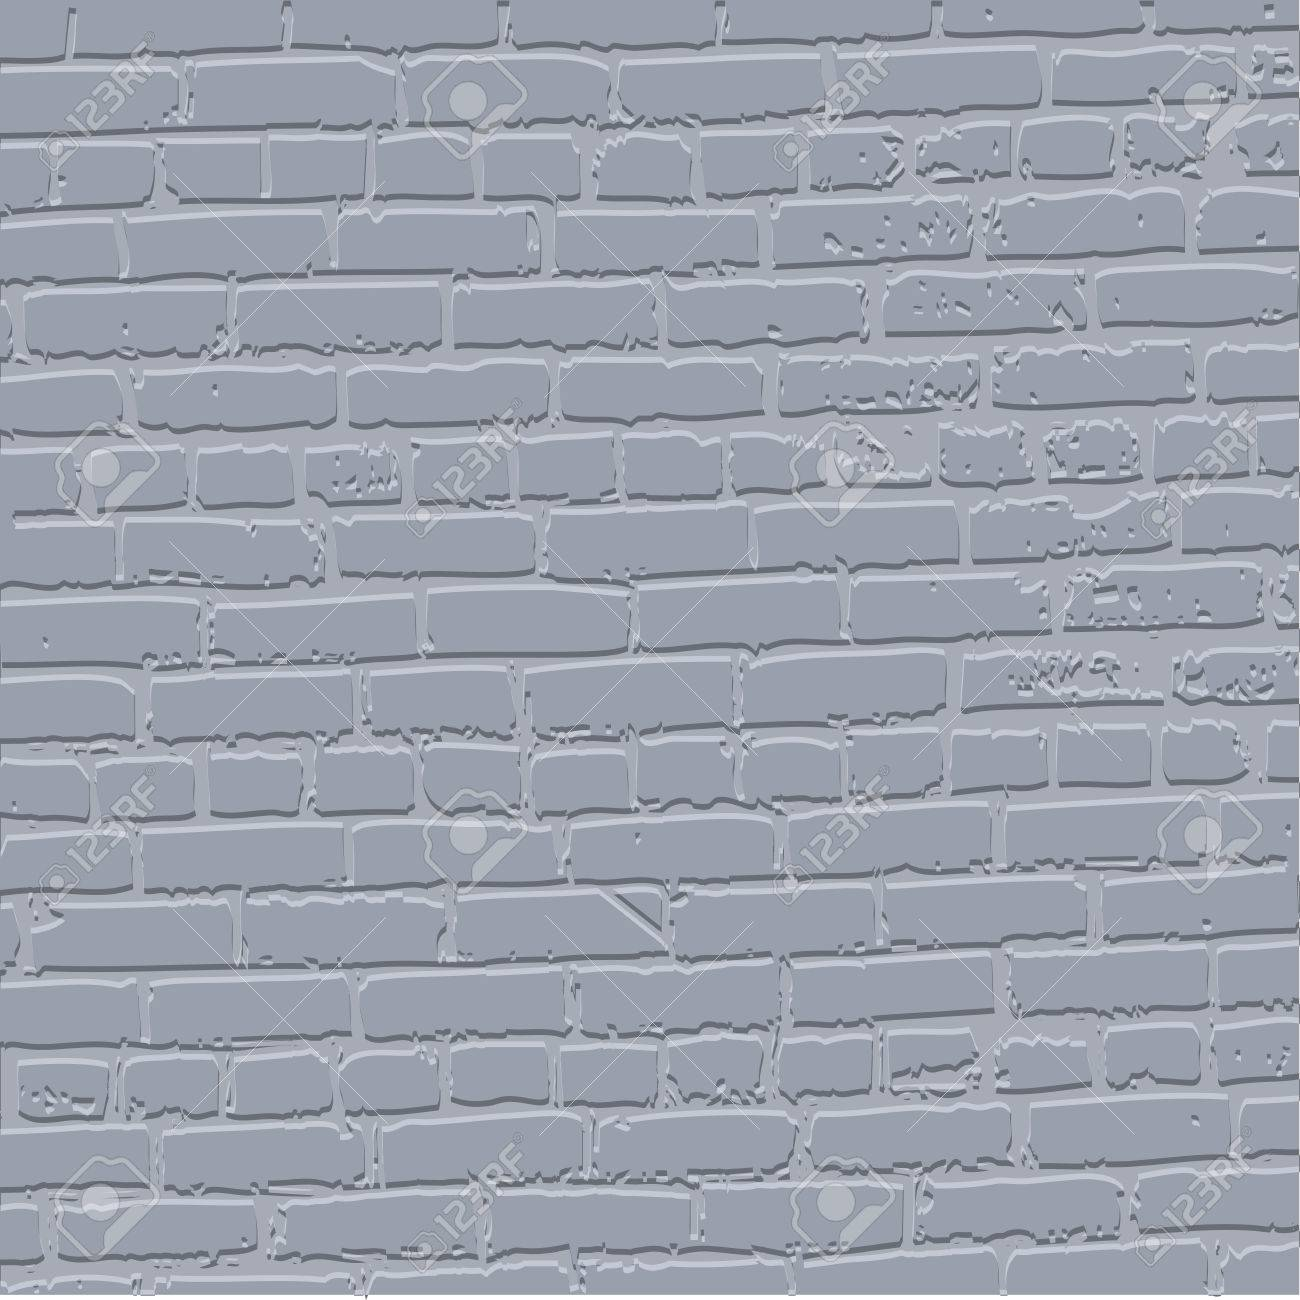 Grey grunge bricked wall background - vector illustration Stock Vector - 13107456